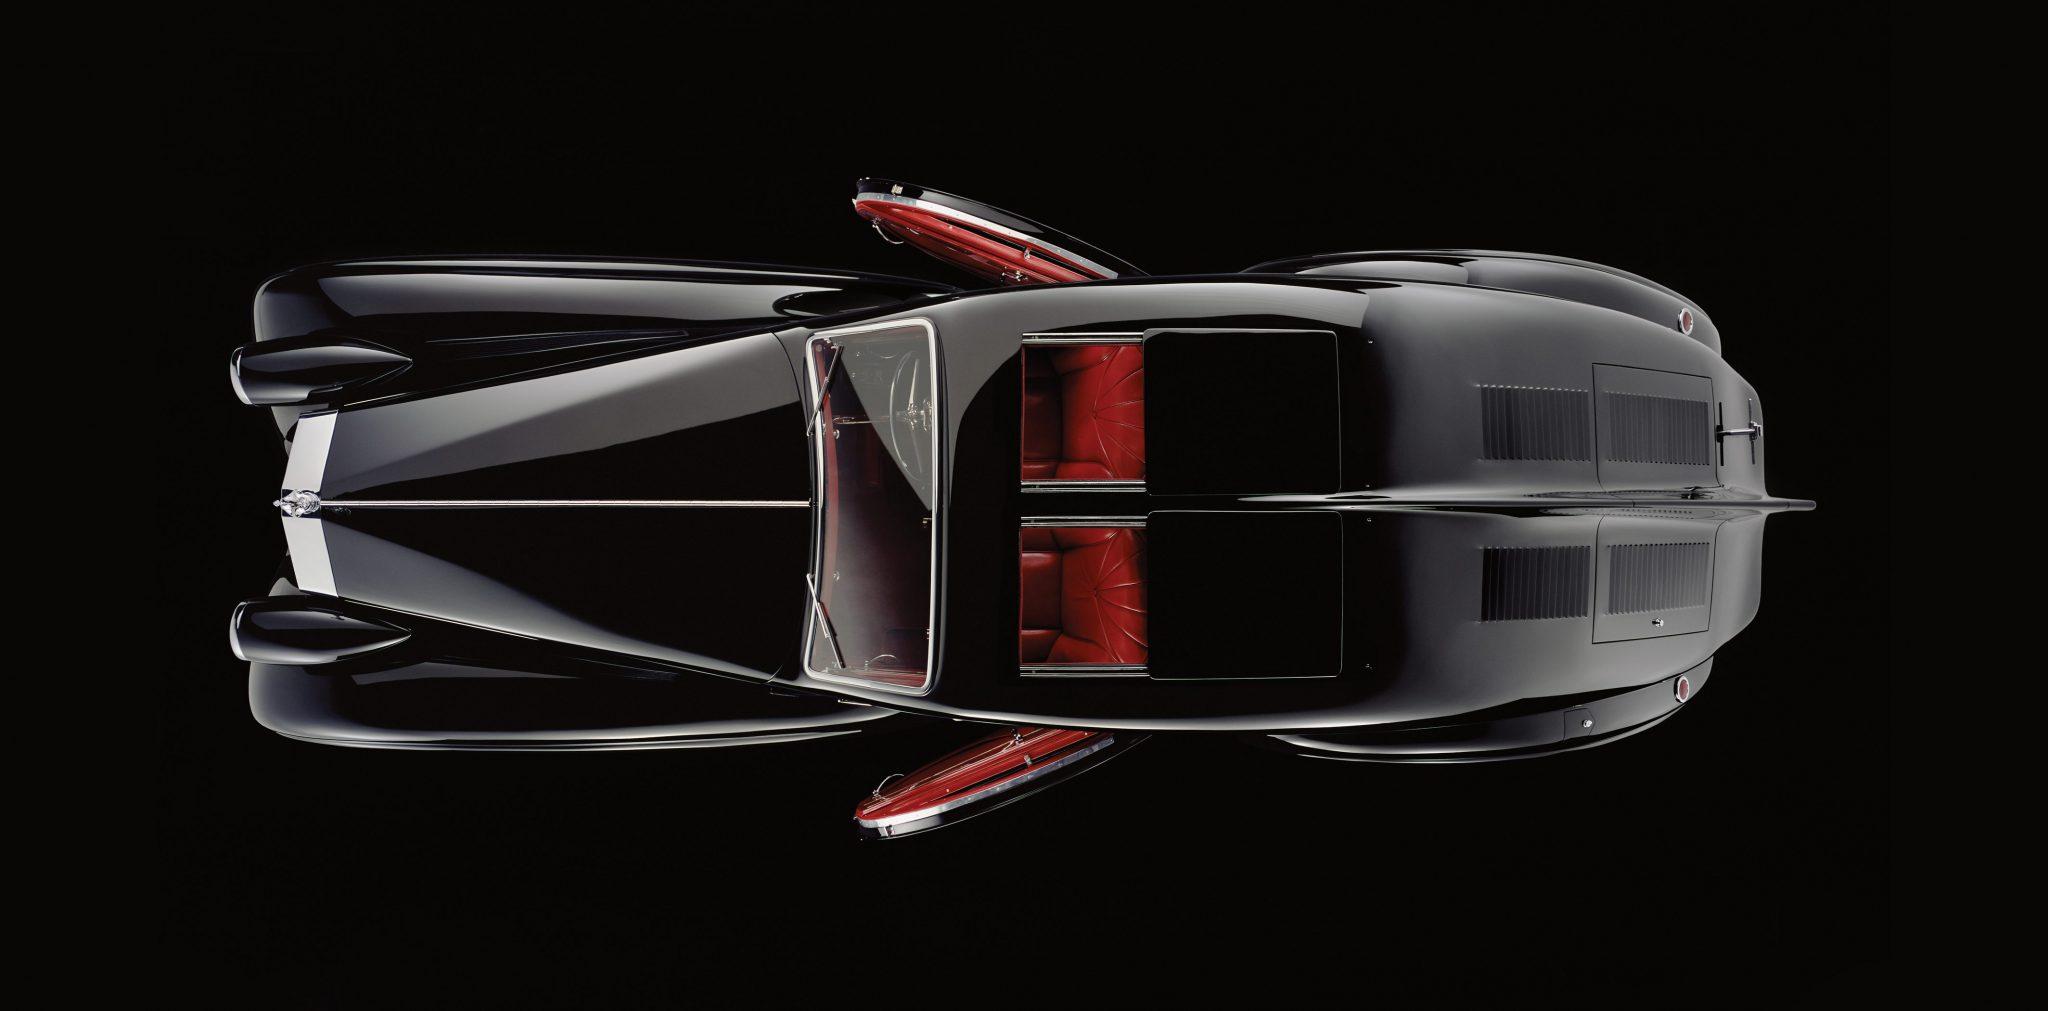 Rolls-Royce Phantom 1 Jonckheere Coupe Top Down View